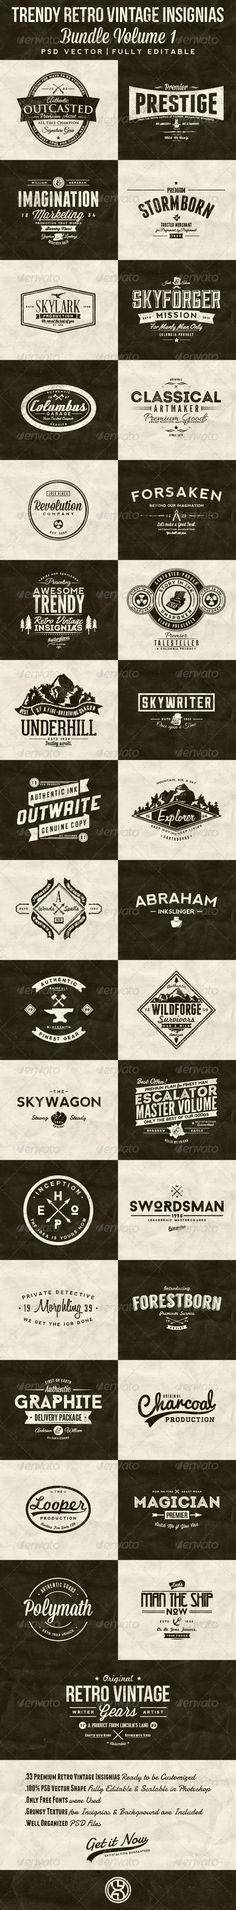 33 Trendy Retro Vintage Insignias Bundle Volume 1 - Badges Stickers Web Elements